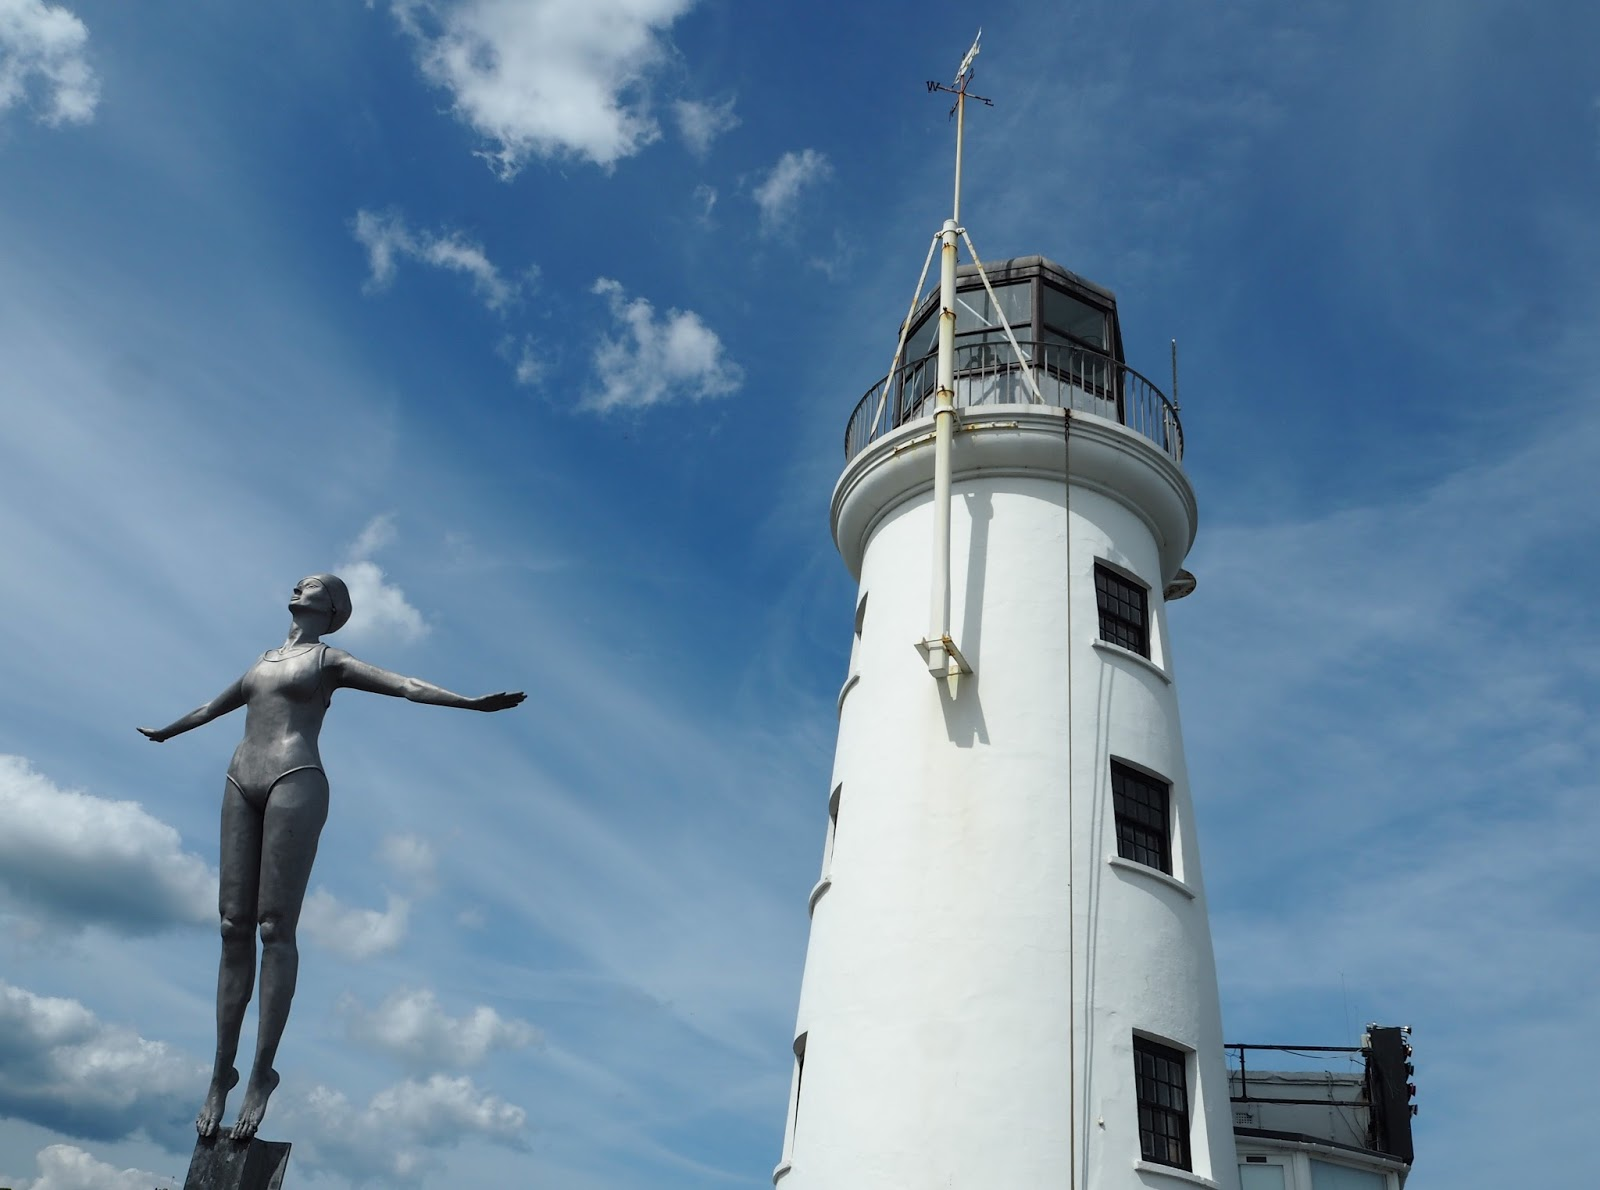 Diving Belle, statue, sculpture Vincents Pier, white lighthouse South Bay, Scarborough